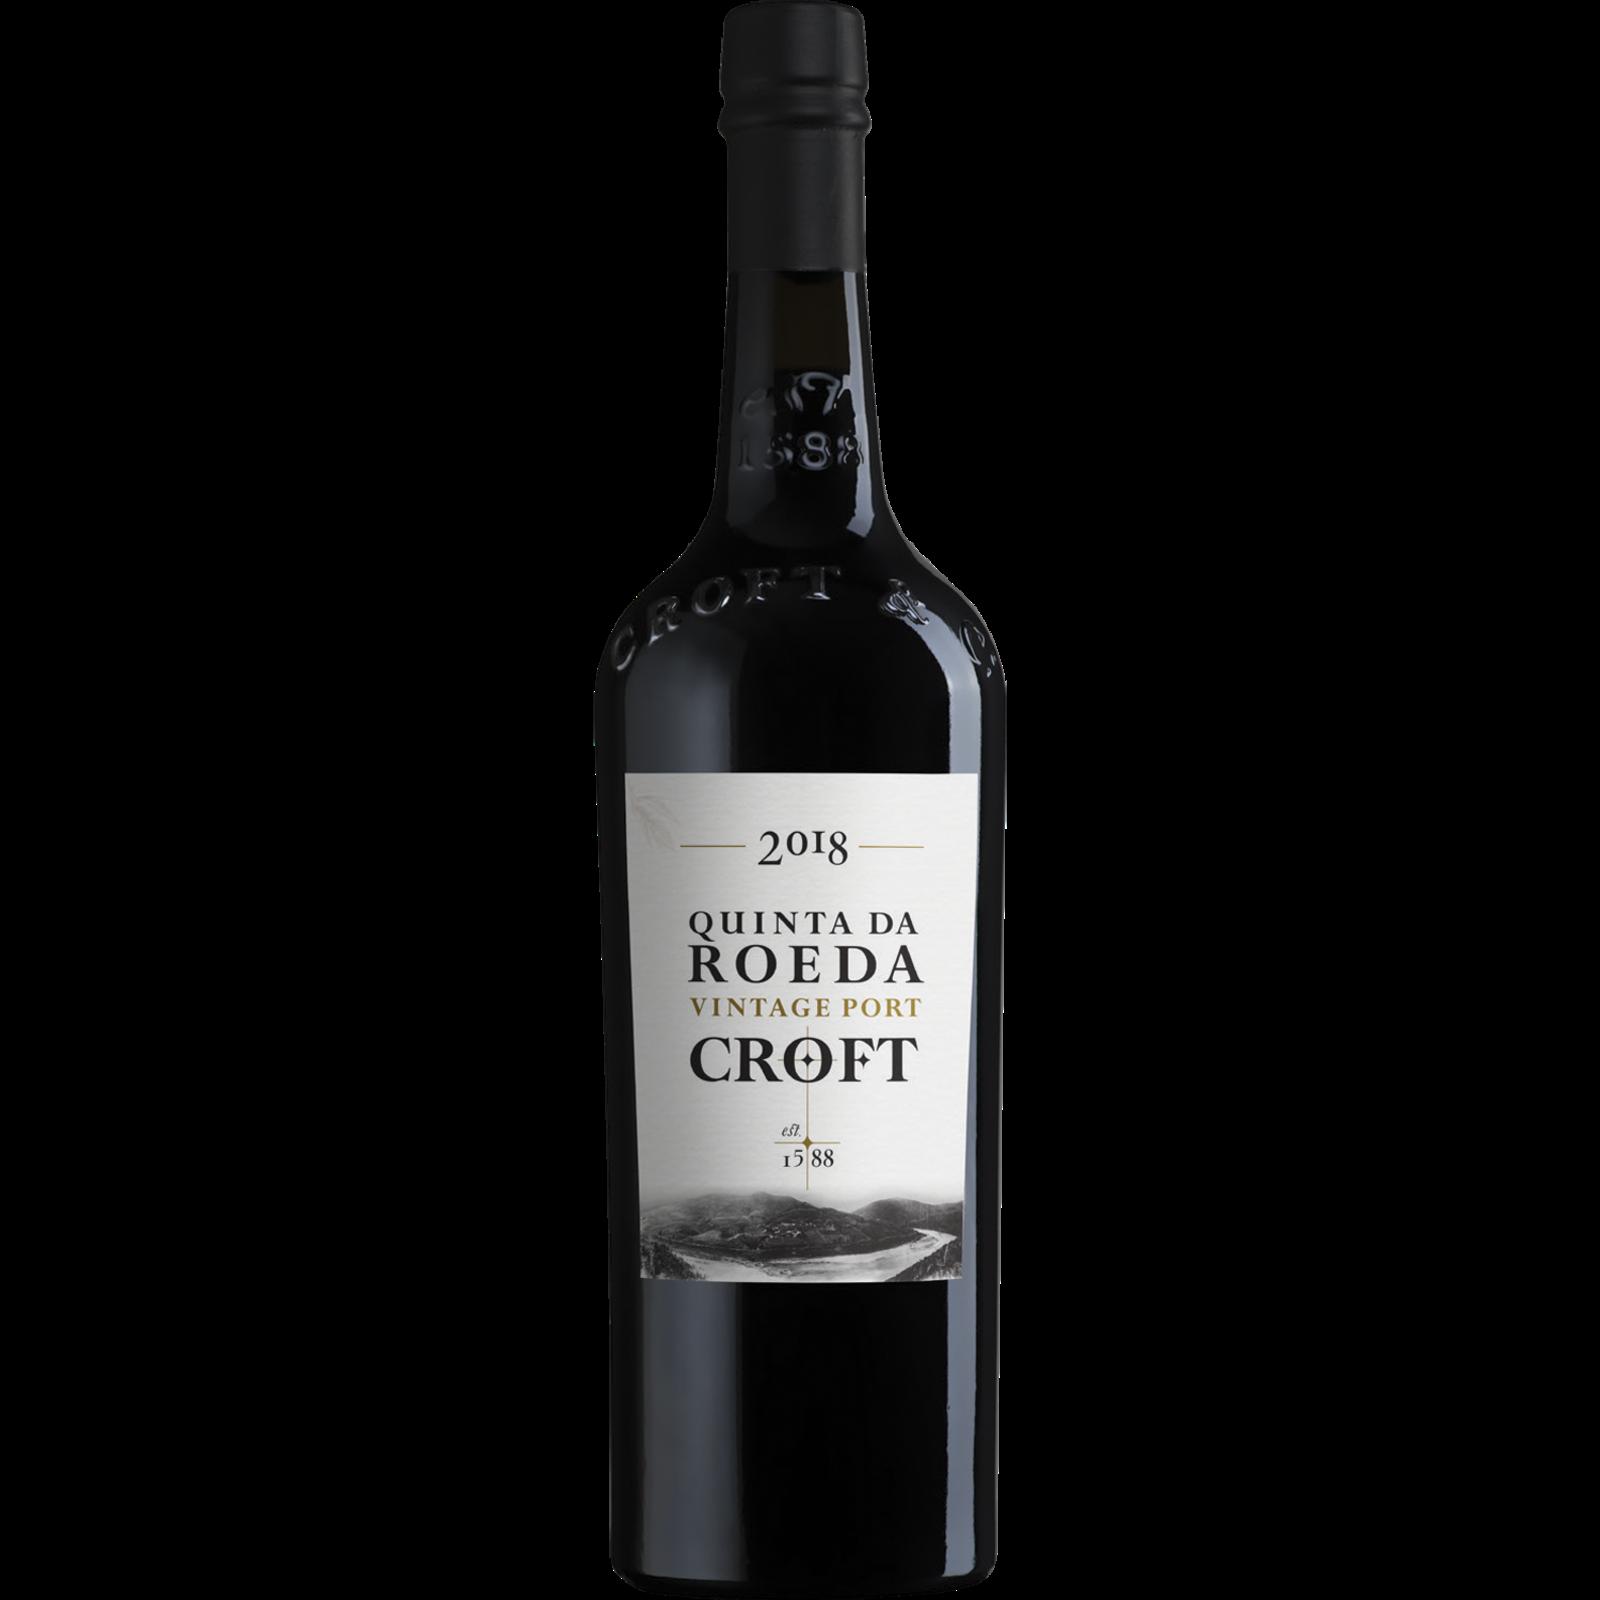 Croft Croft Quinta de Roeda Vintage Port 2018 (1/2 fles)